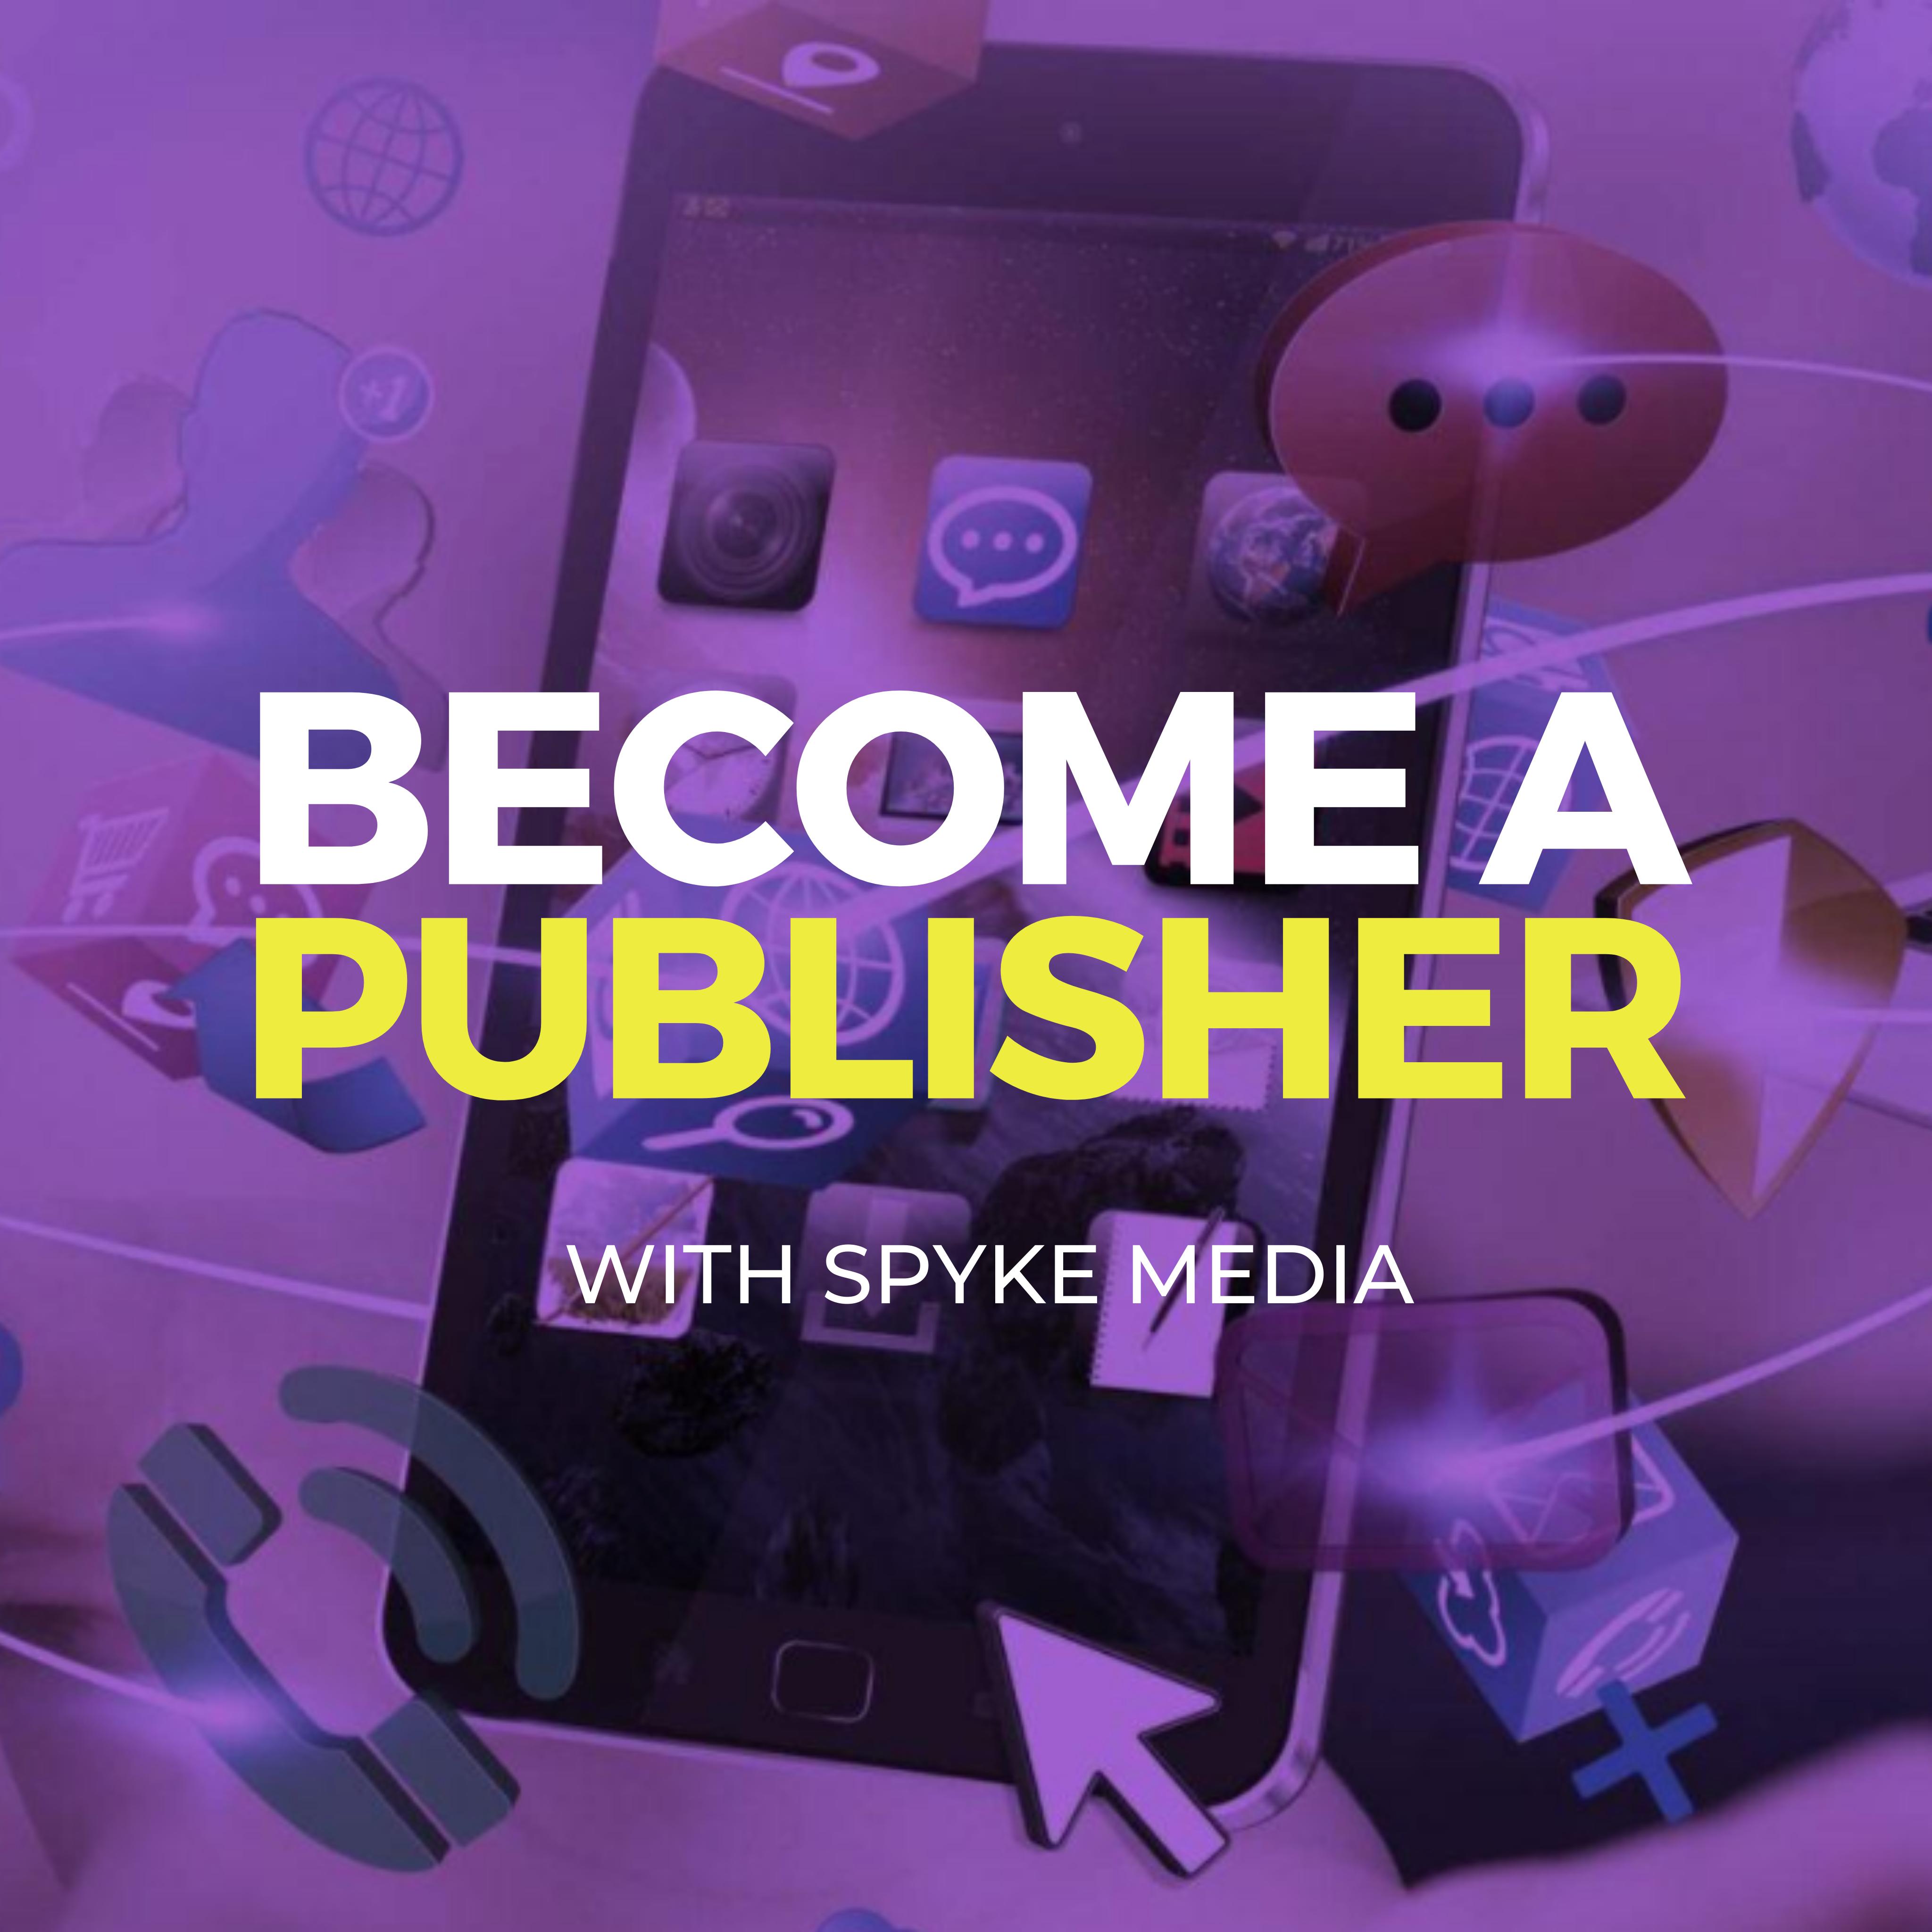 Spyke Media - Your Partner for Mobile Marketing